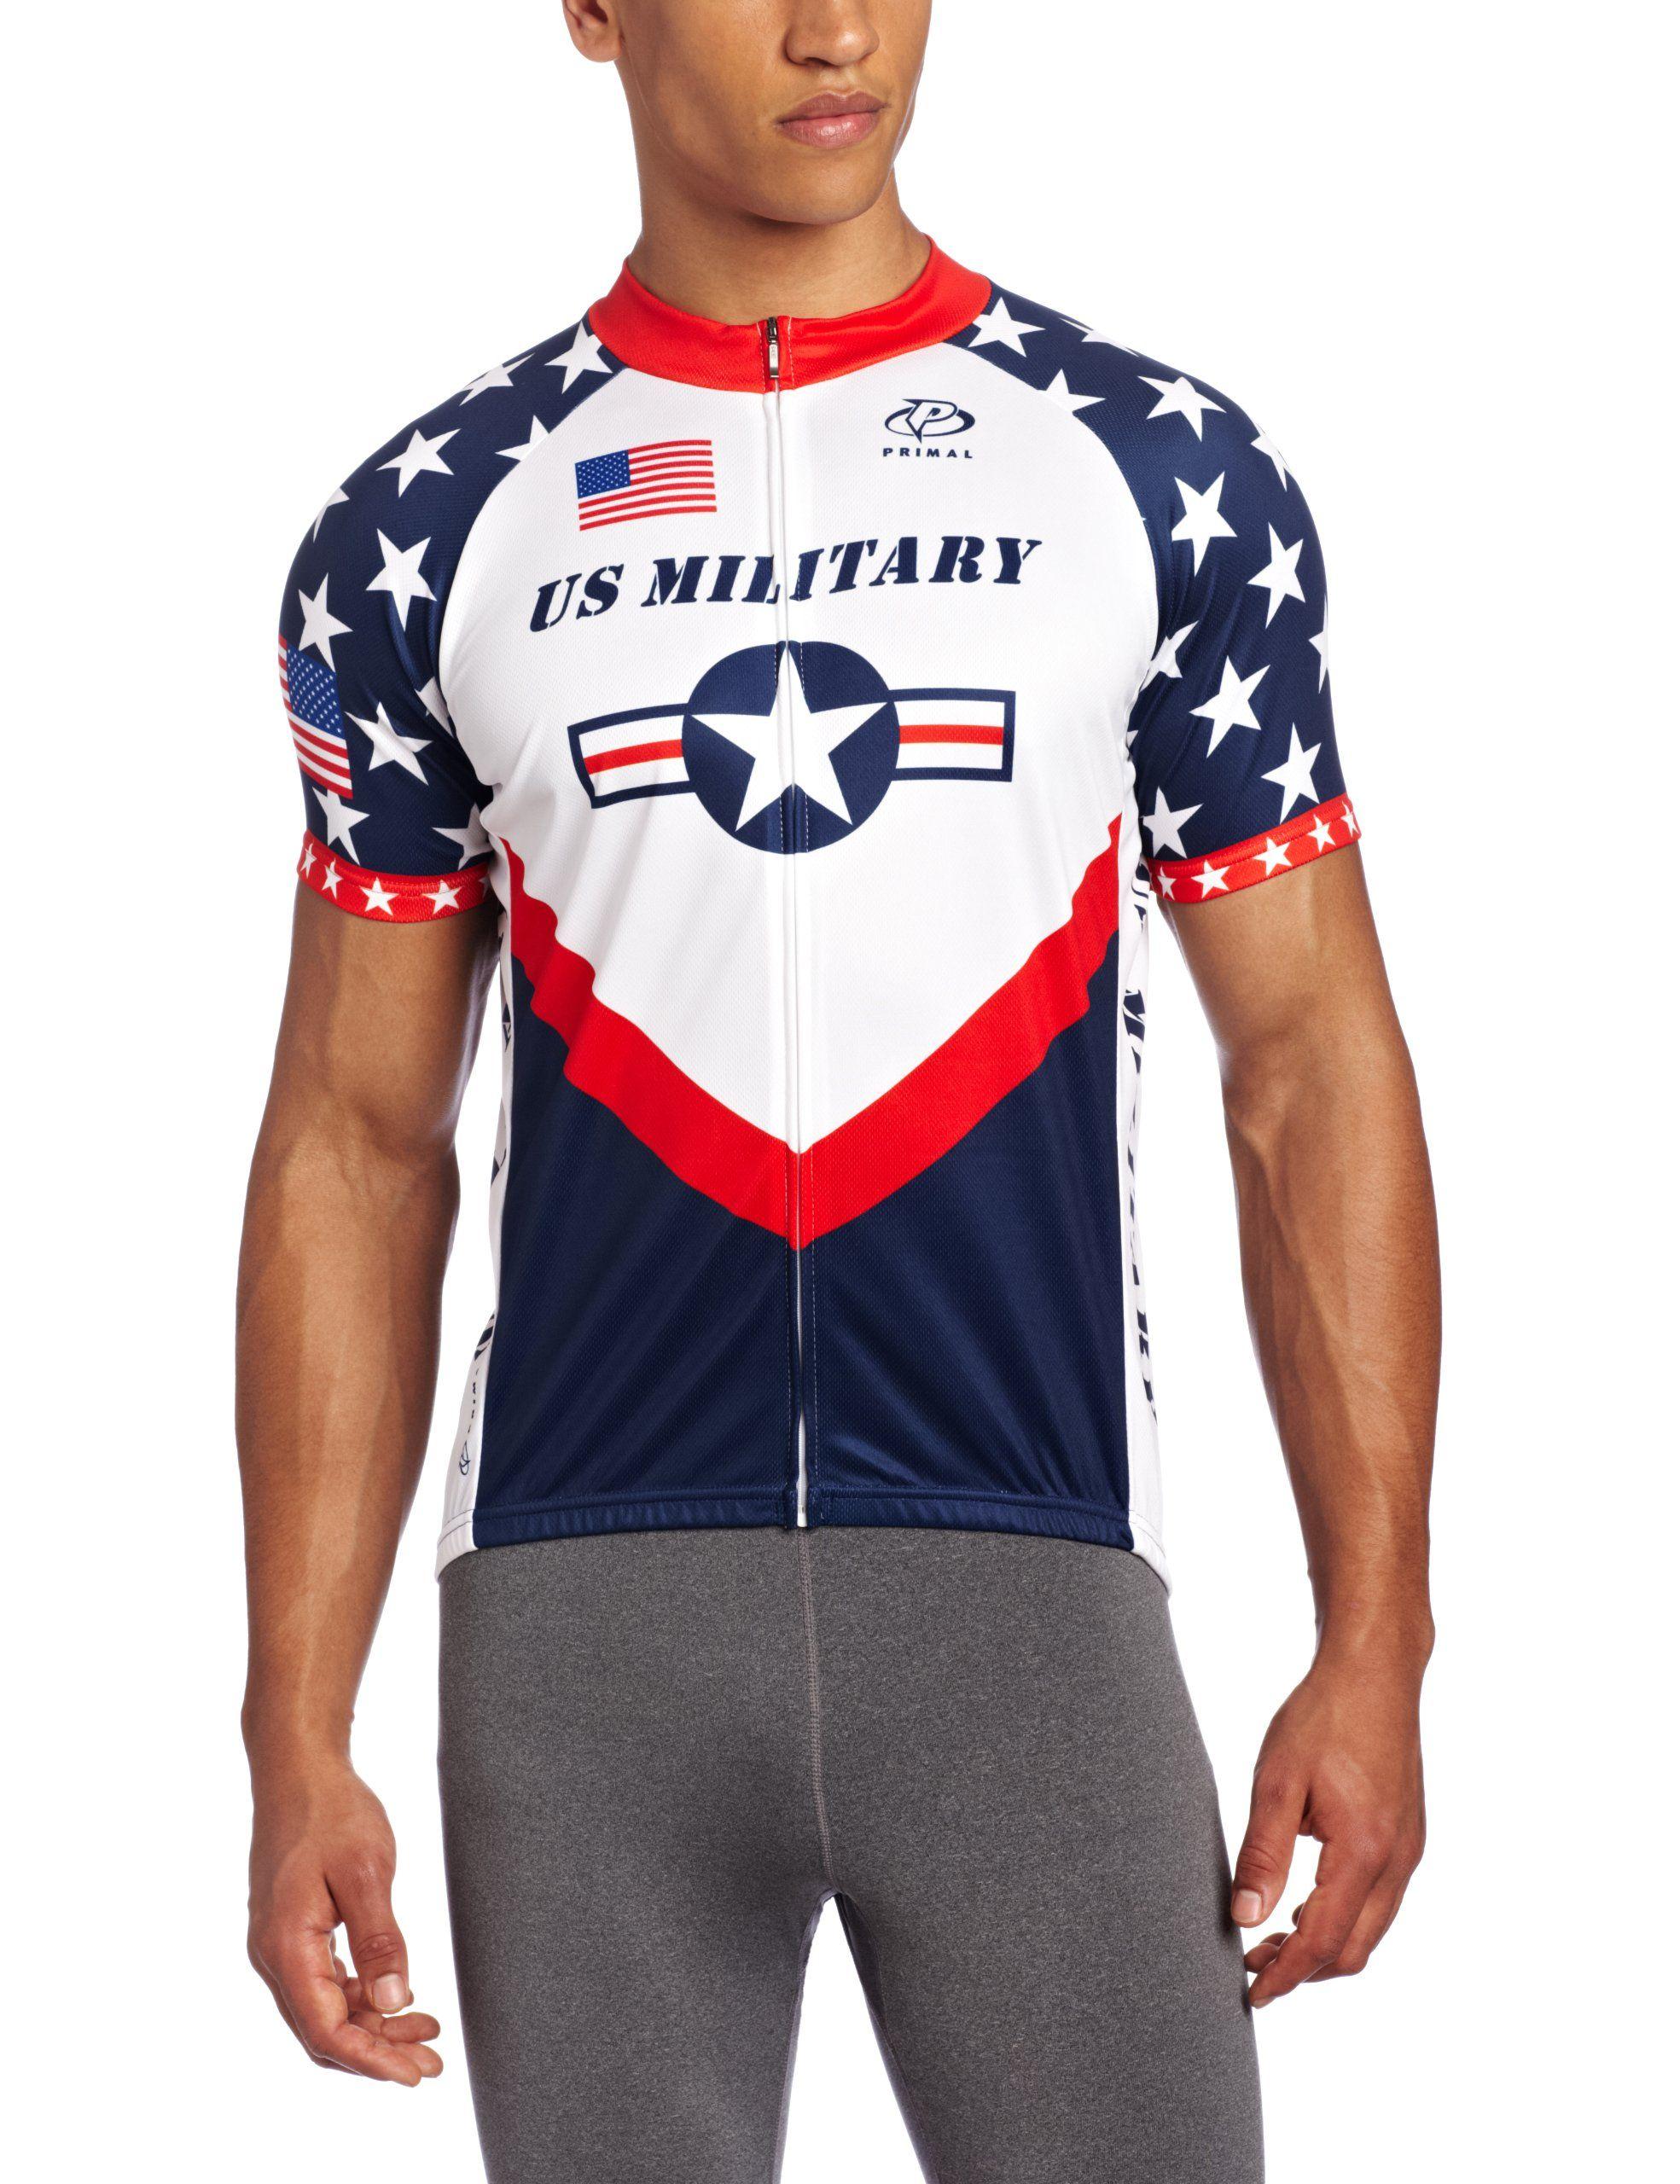 cec0b8129 Primal Wear Men s U.S. Military Team Cycling Jersey